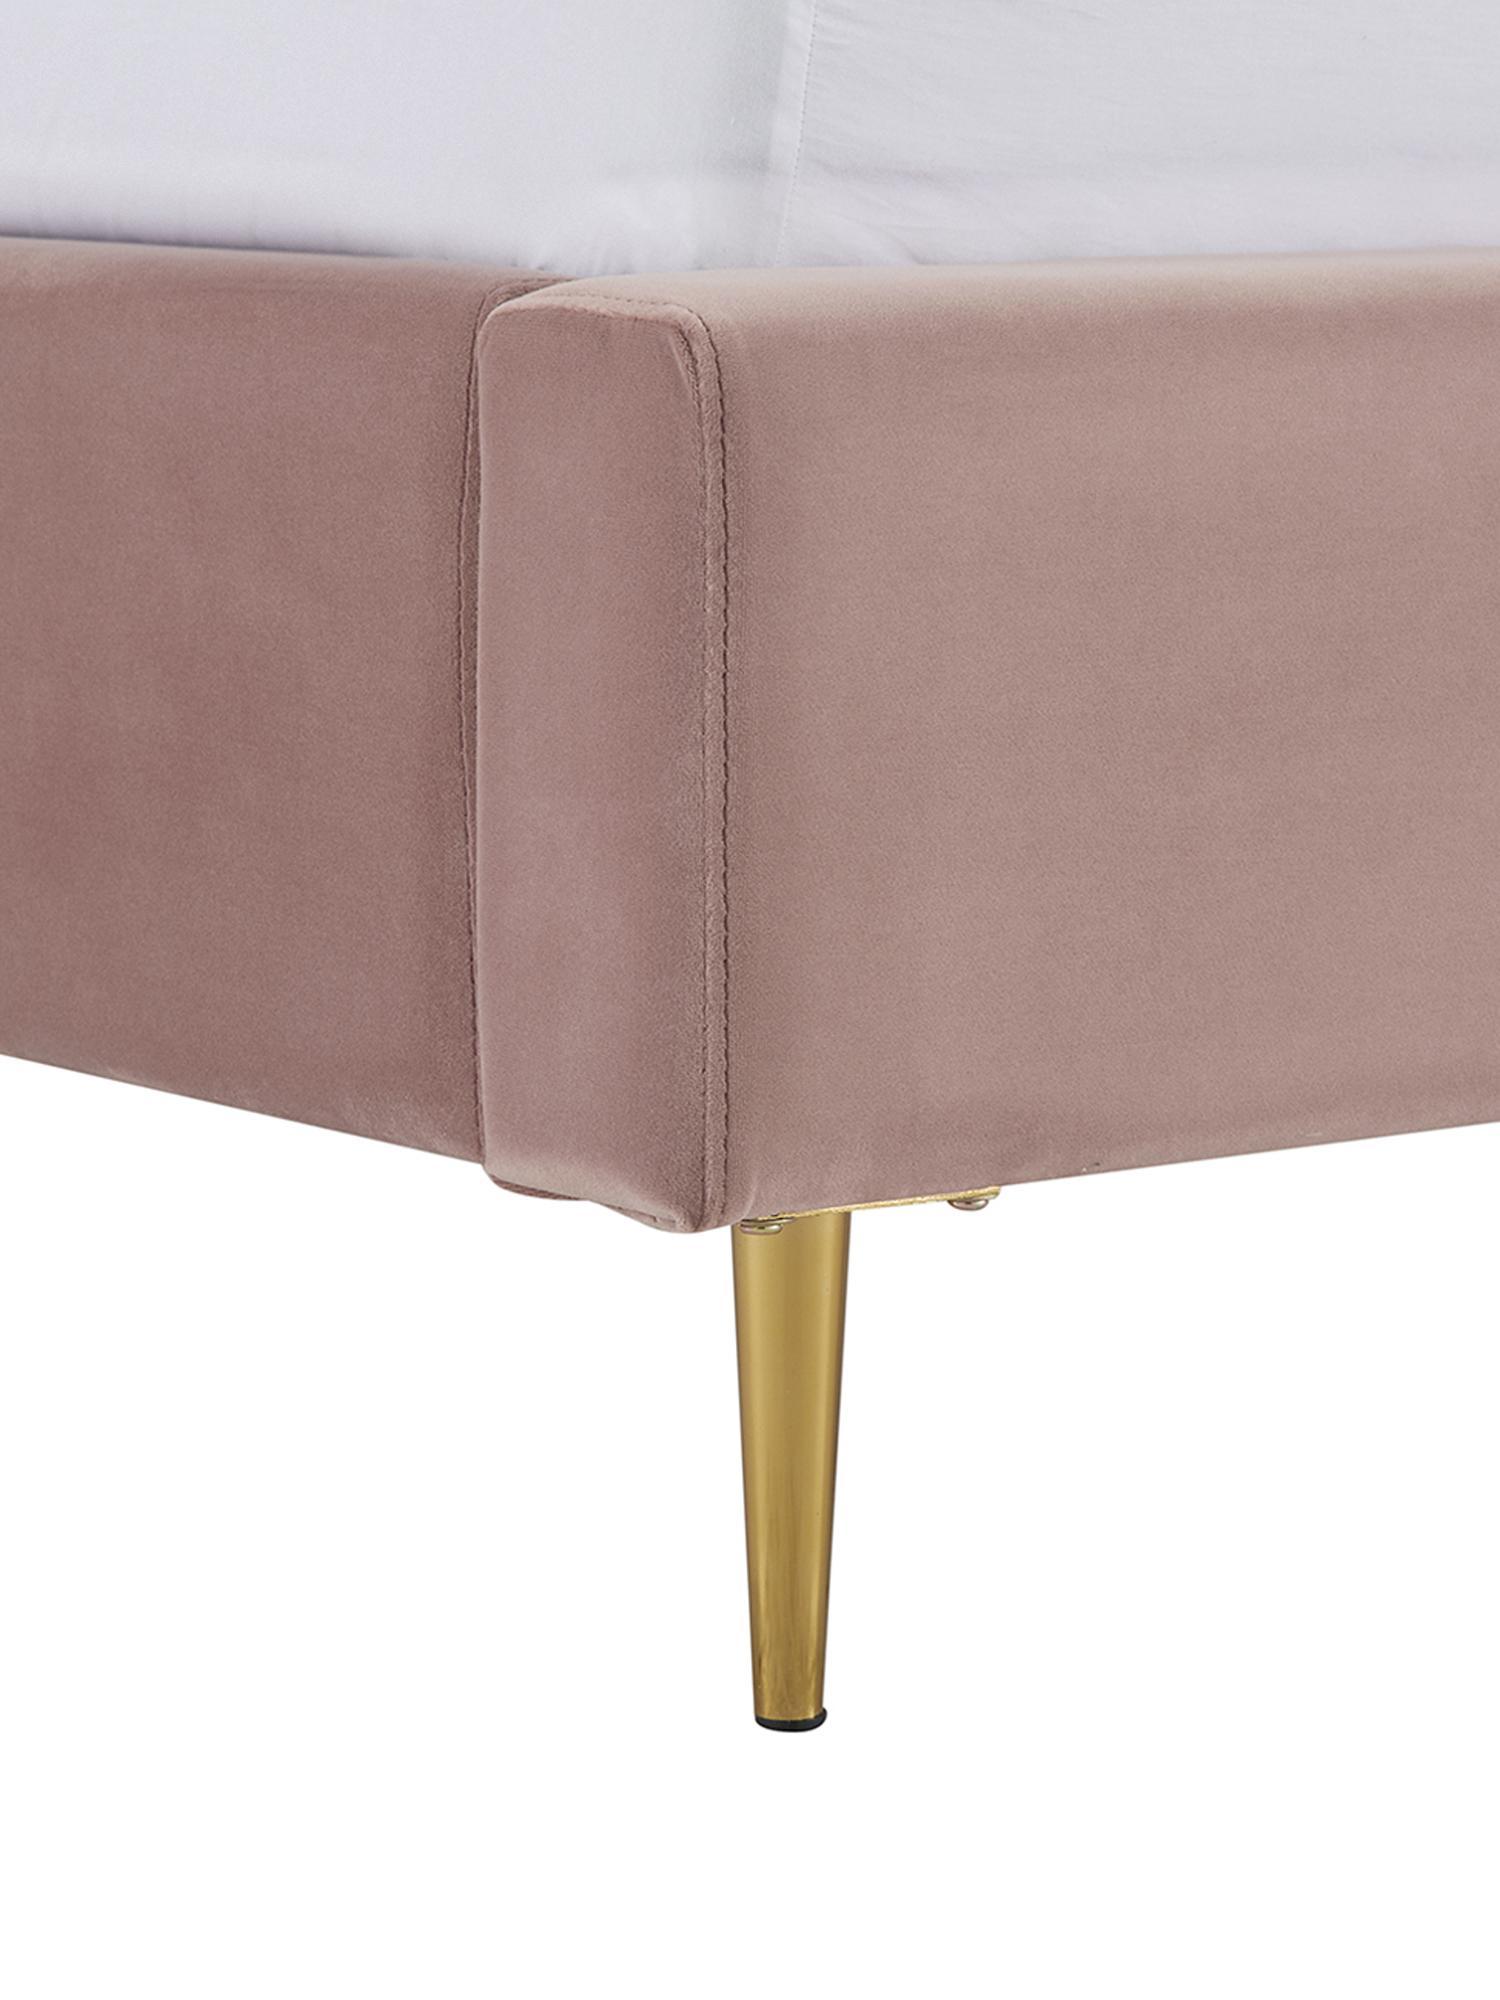 Samt-Polsterbett Glamour, Korpus: Massives Kiefernholz, Füße: Metall, vermessingt, Bezug: Samt (Polyester) 100.000 , Bezug: AltrosaFüße: Goldfarben, glänzend, 160 x 200 cm